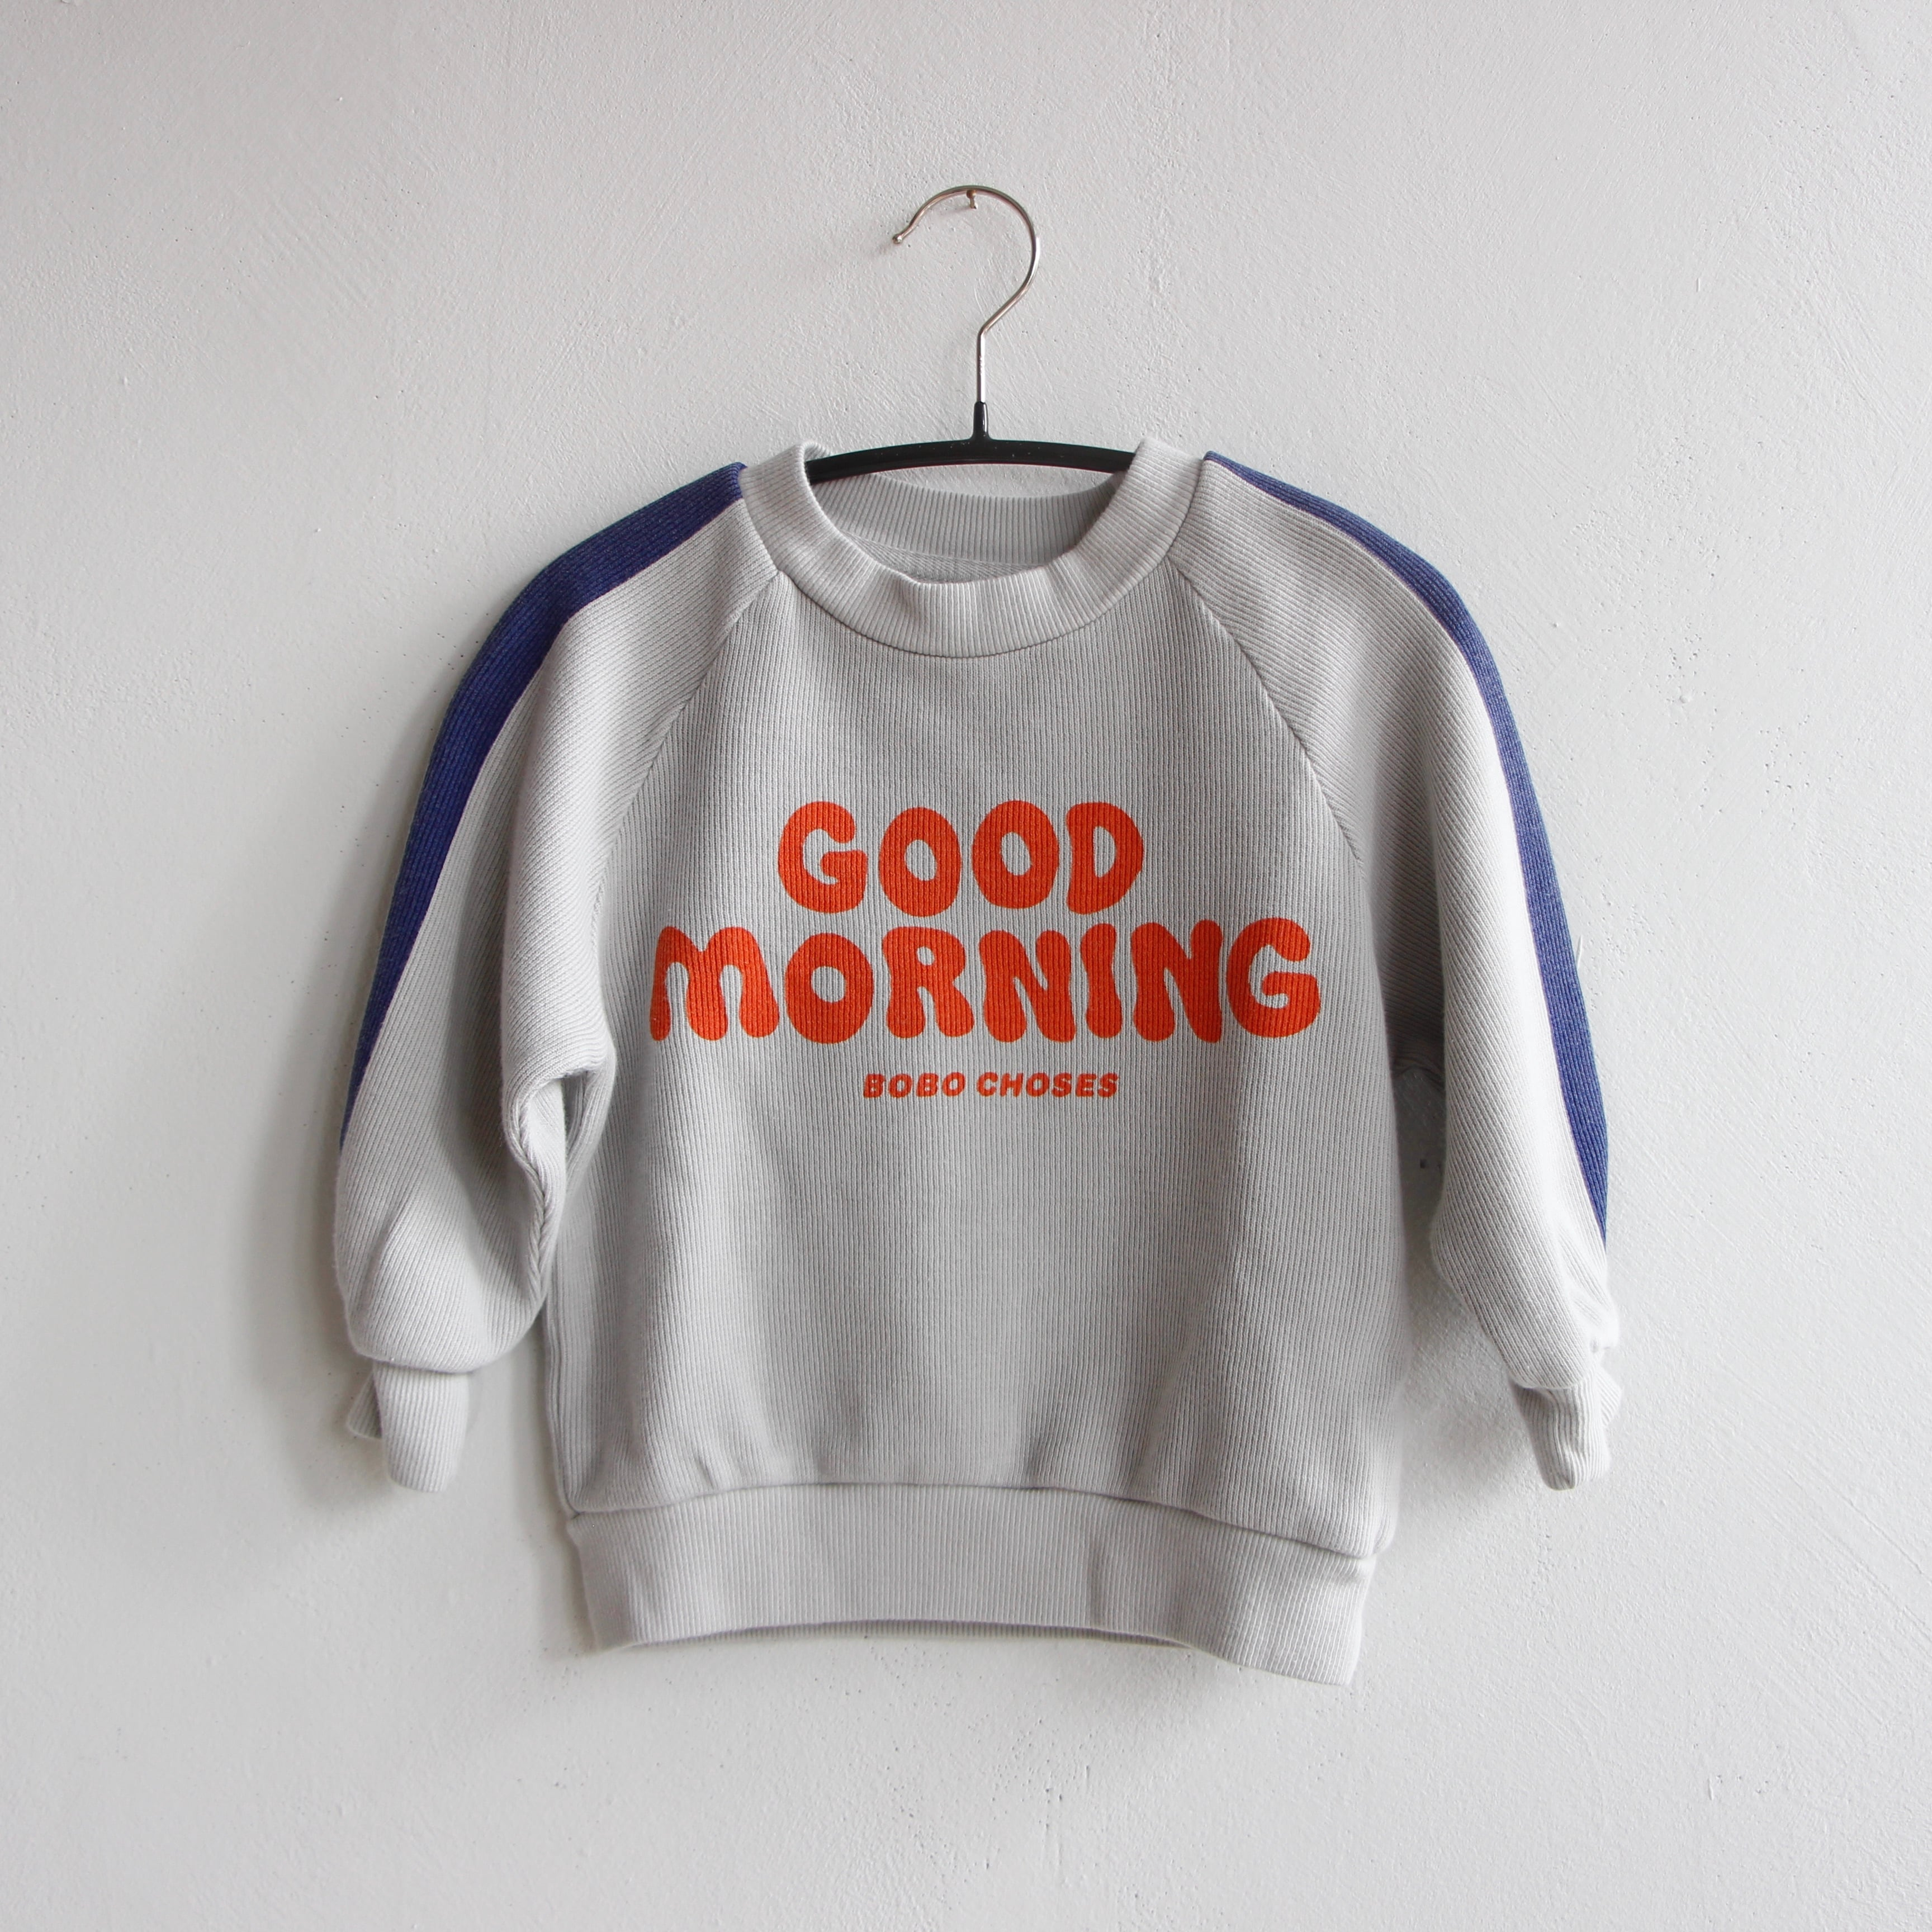 《BOBO CHOSES 2021AW》Good Morning sweatshirt / 12-36M